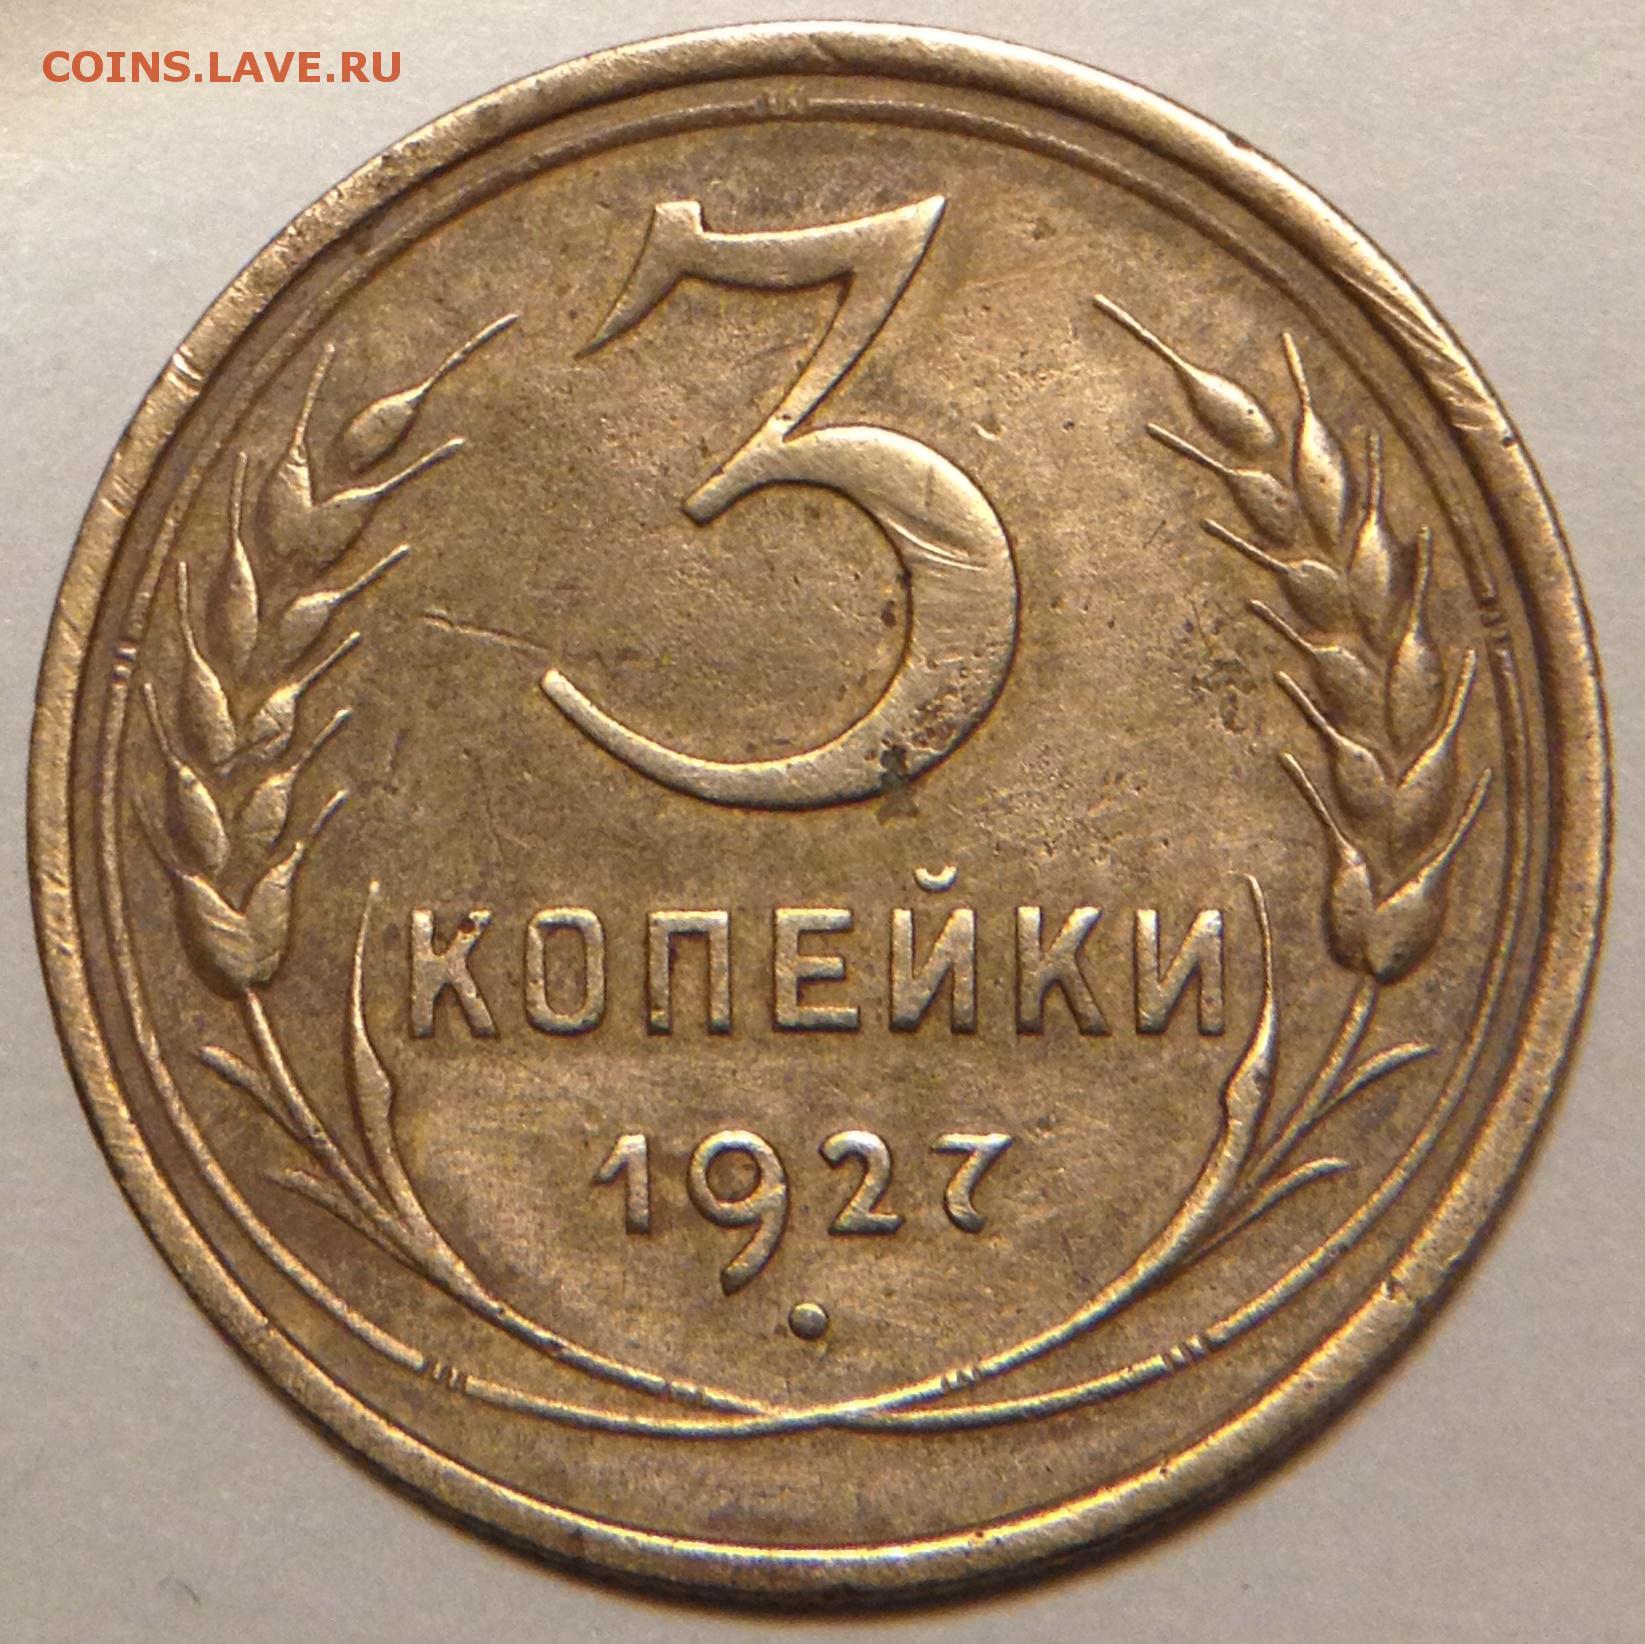 Go to the монеты (нумизматика) категория archives